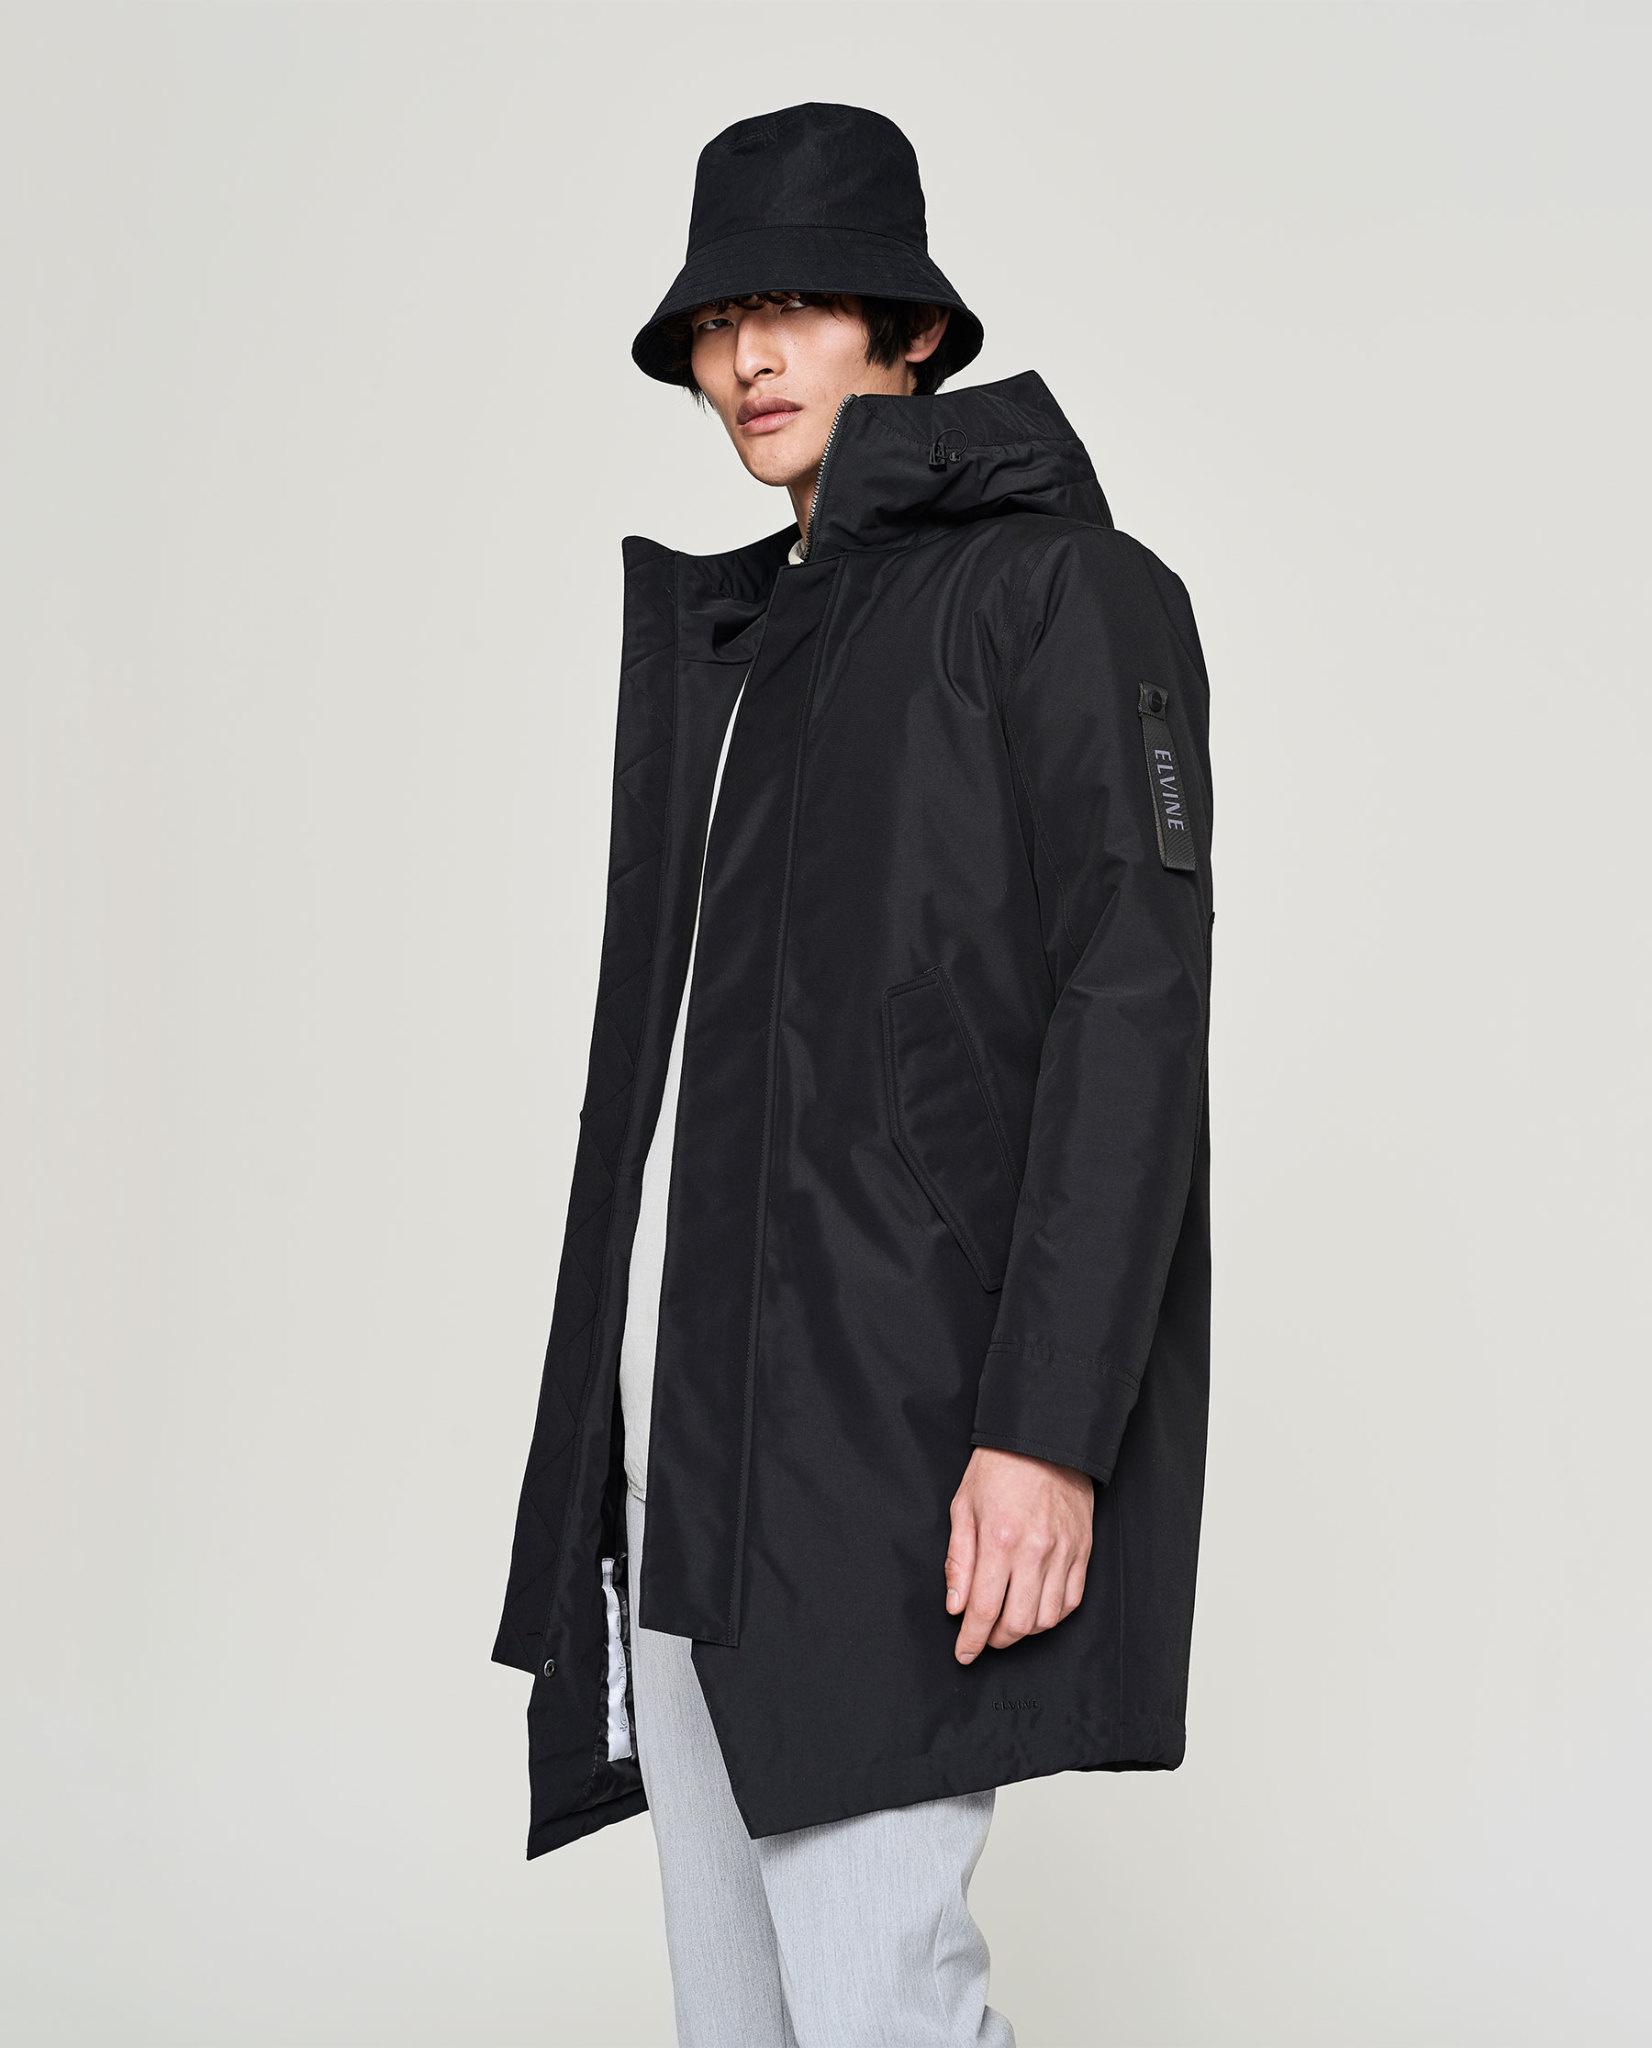 Elvine Elvine Gunter Jacket Black